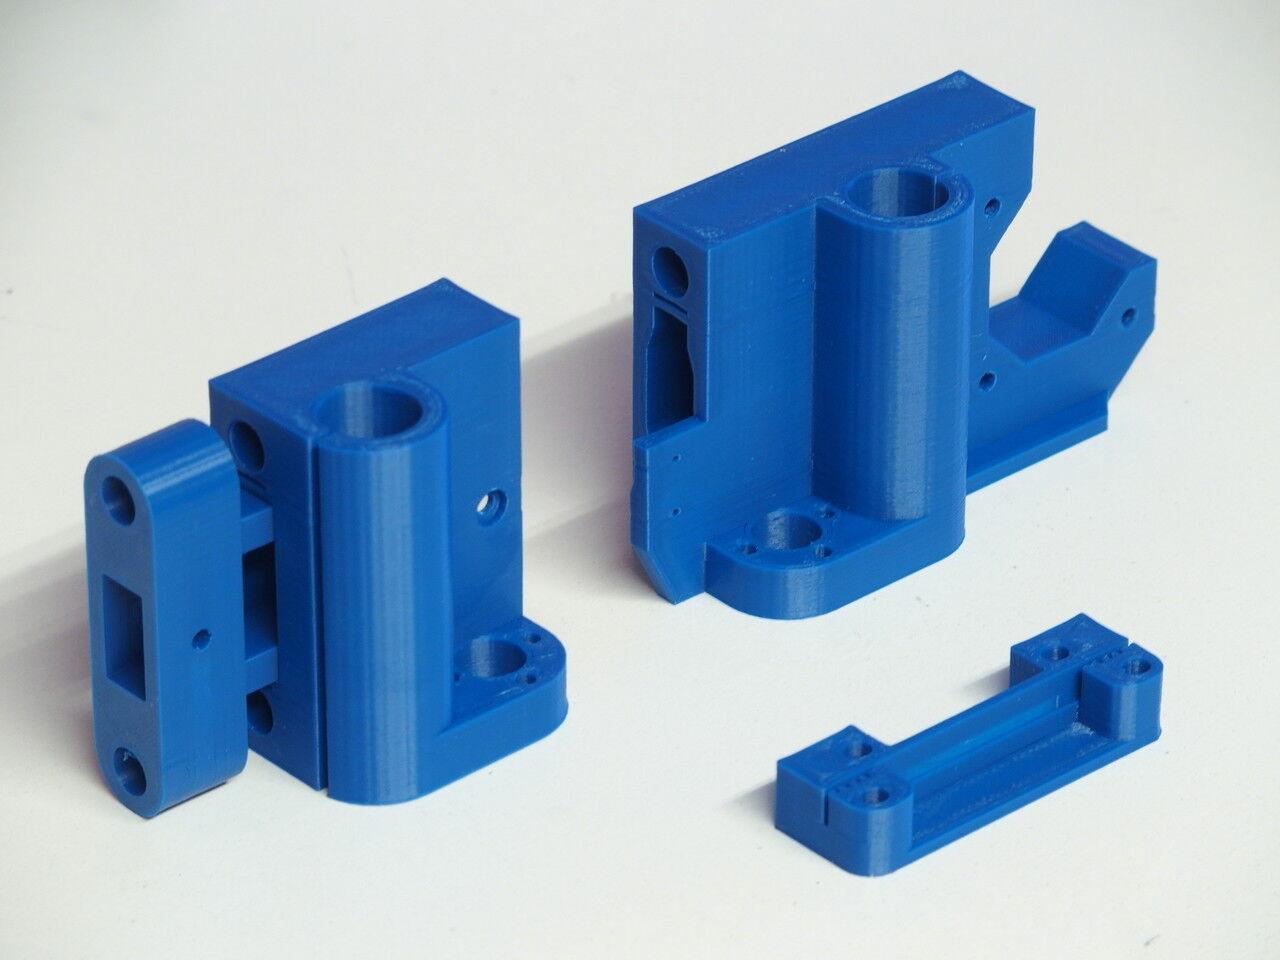 3d-drucker Anet A8 To Am8 Conversion Kit Metal Frame Rebuild Kit Parts Umbausatz Teile Abs 3d-drucker & Zubehör